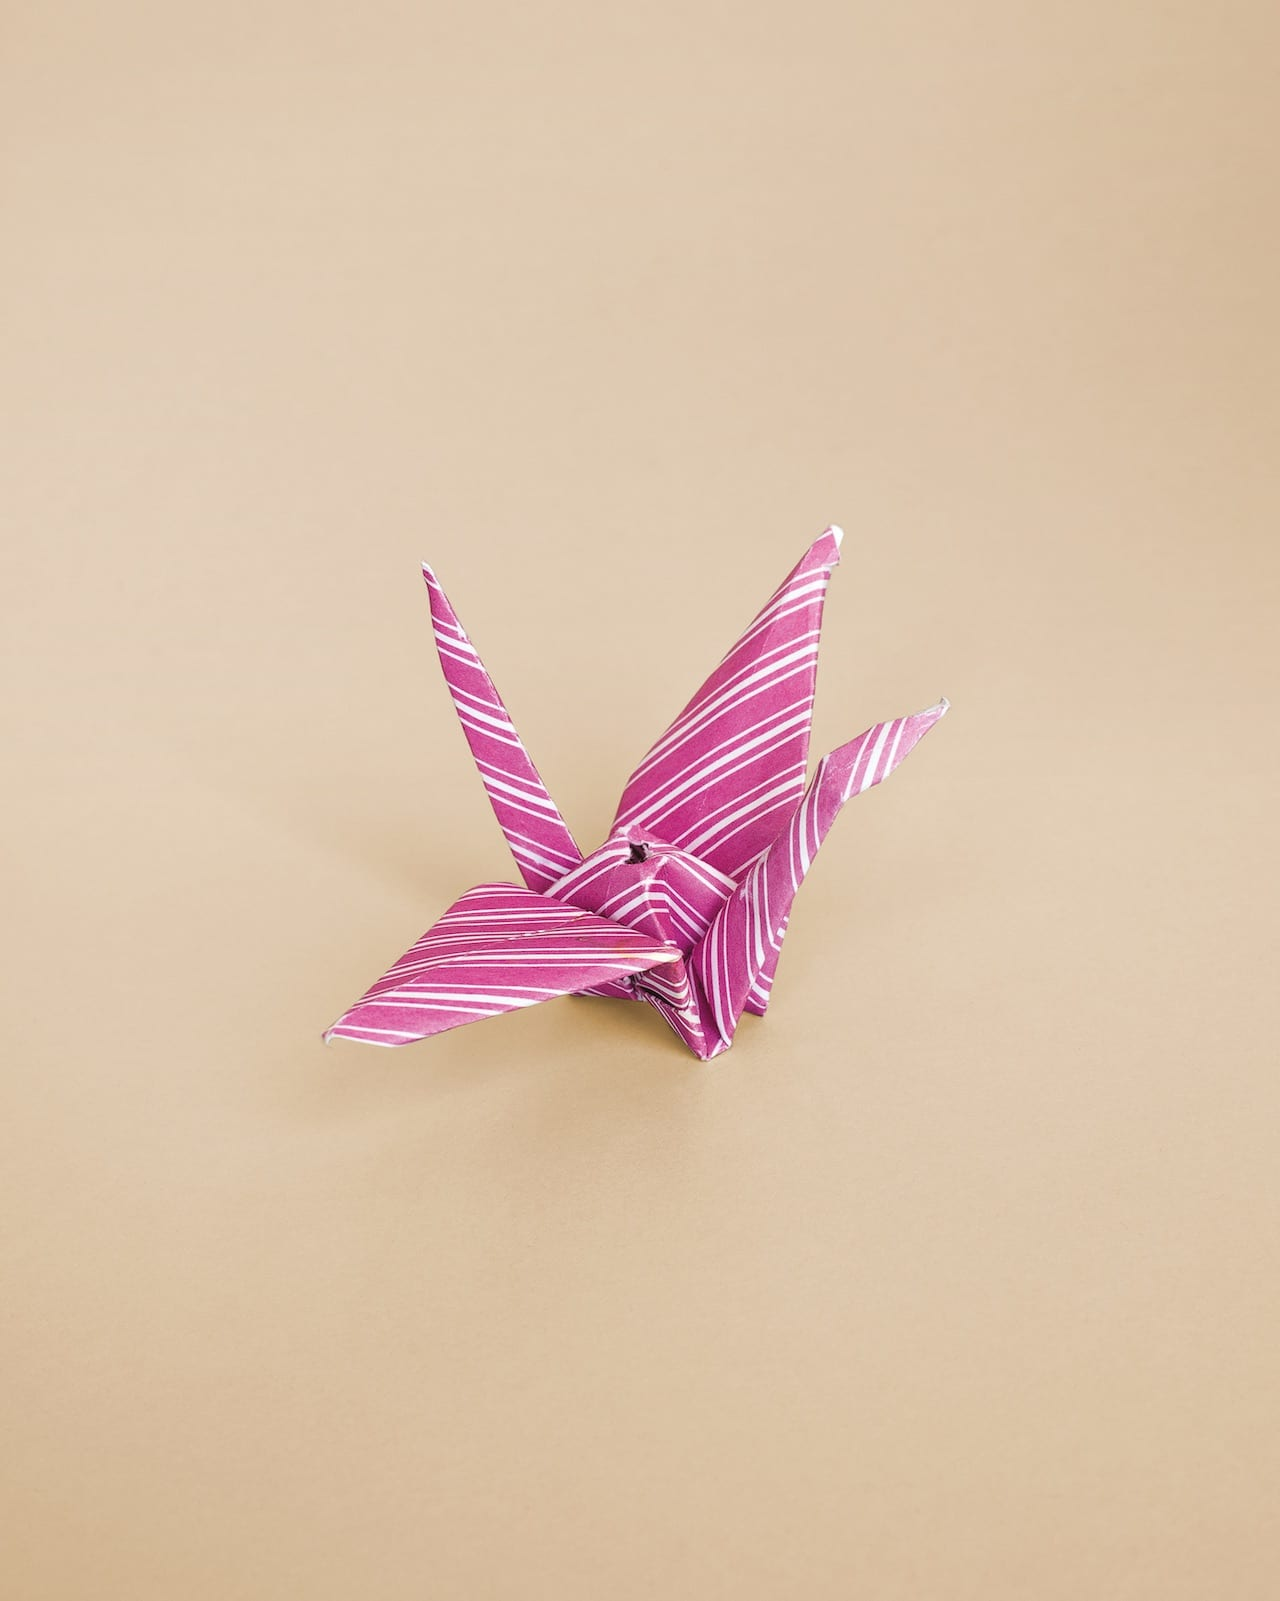 How to make a paper gun origami - Origami BEST #origami - YouTube | 1601x1280